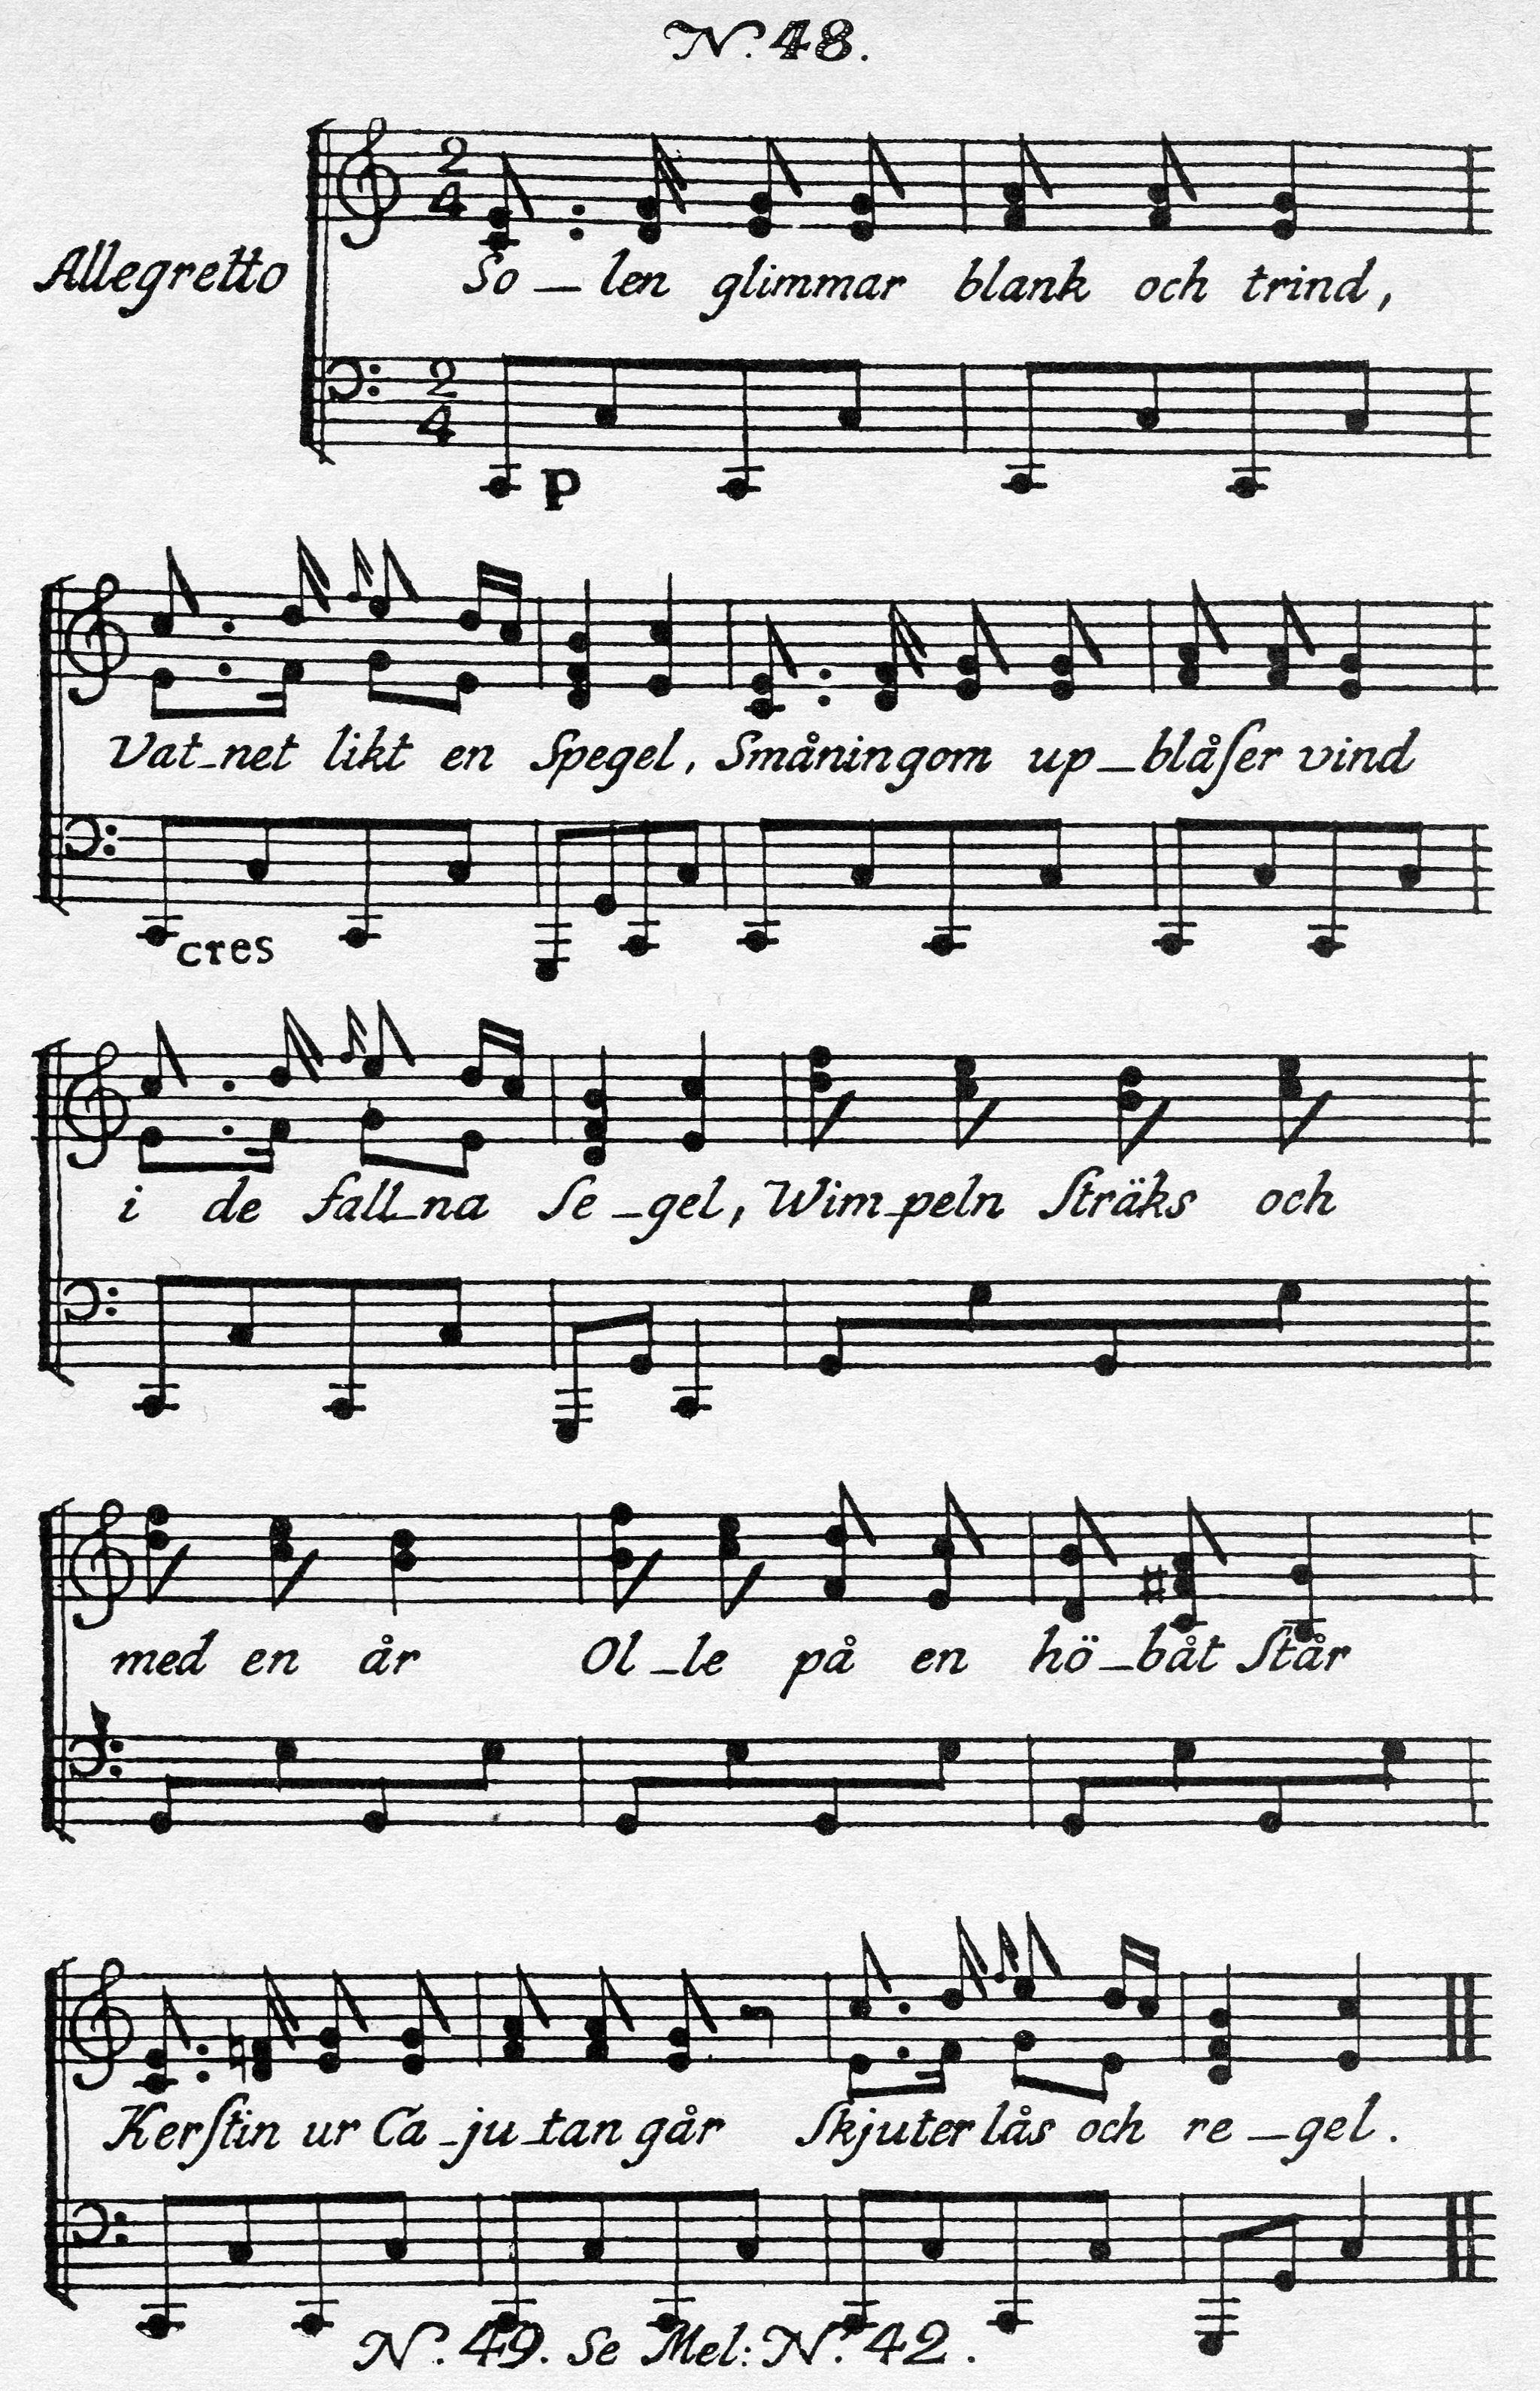 Sheet Music Chord Chart: Solen glimmar blank och trind - Wikipedia,Chart